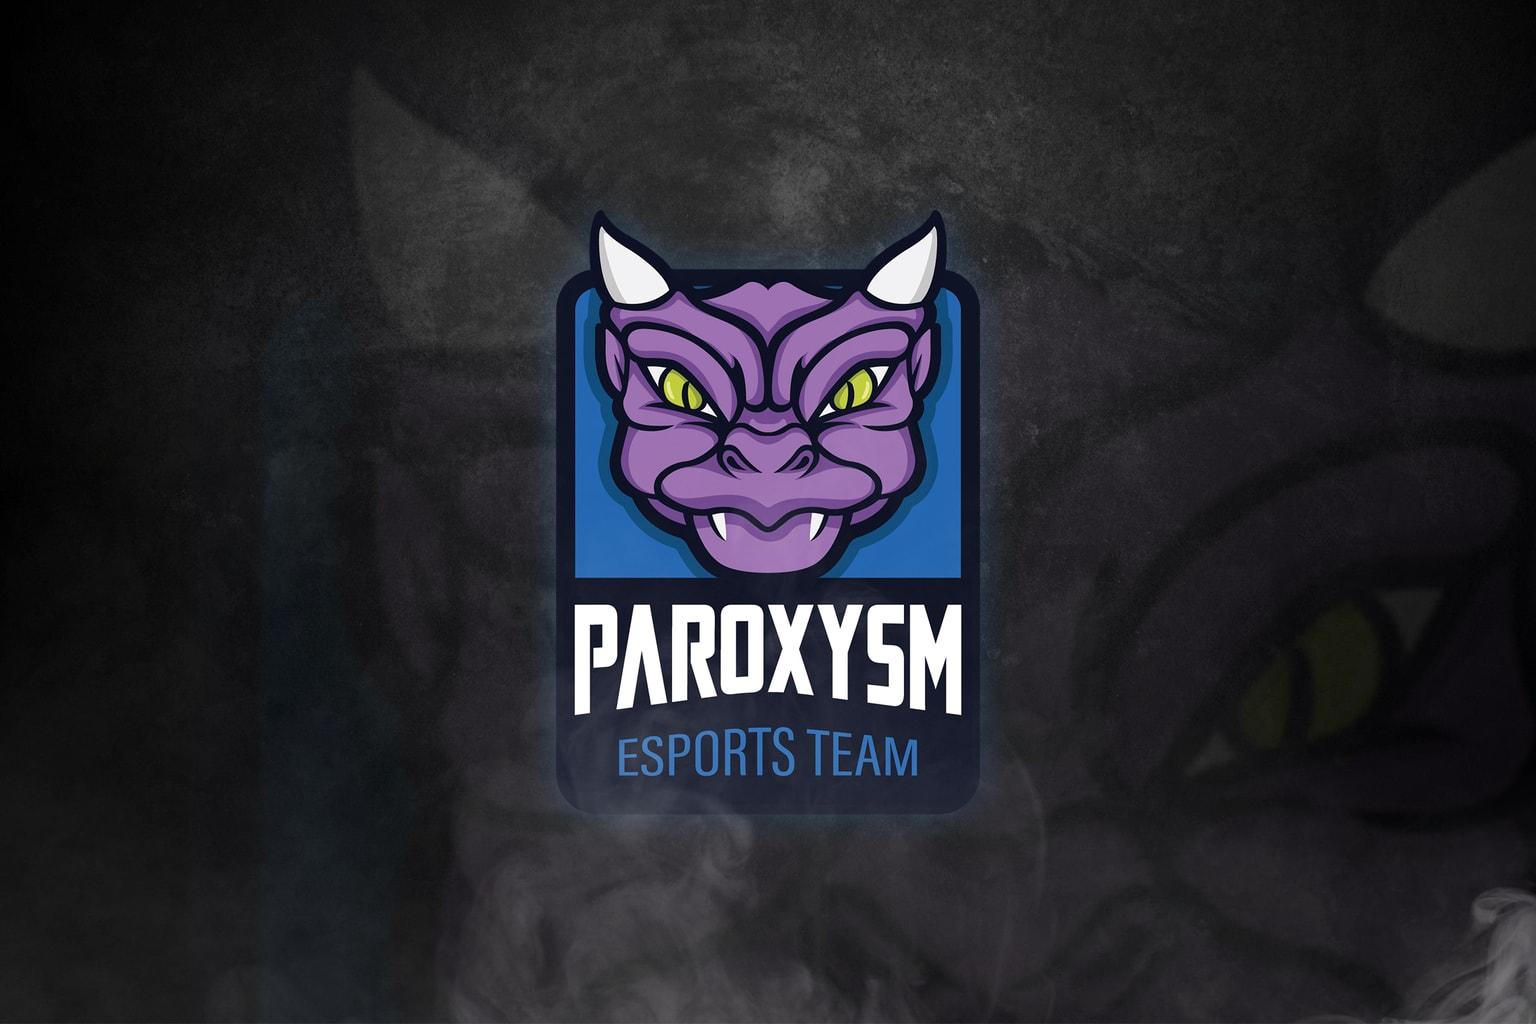 esport logo paroxysm team